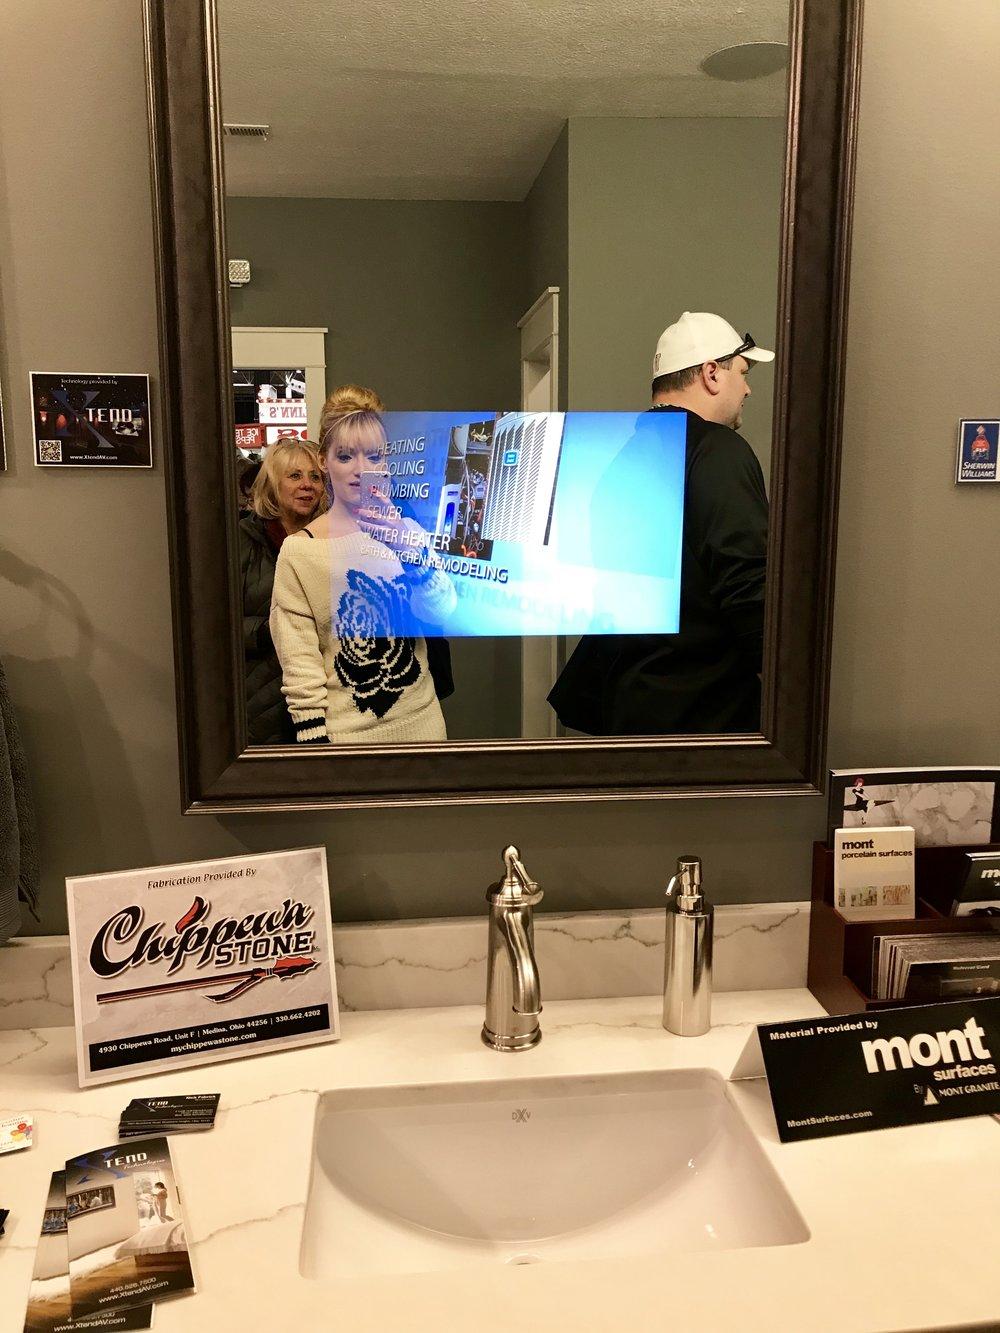 TV/Computer Screen in your Bathroom Mirror